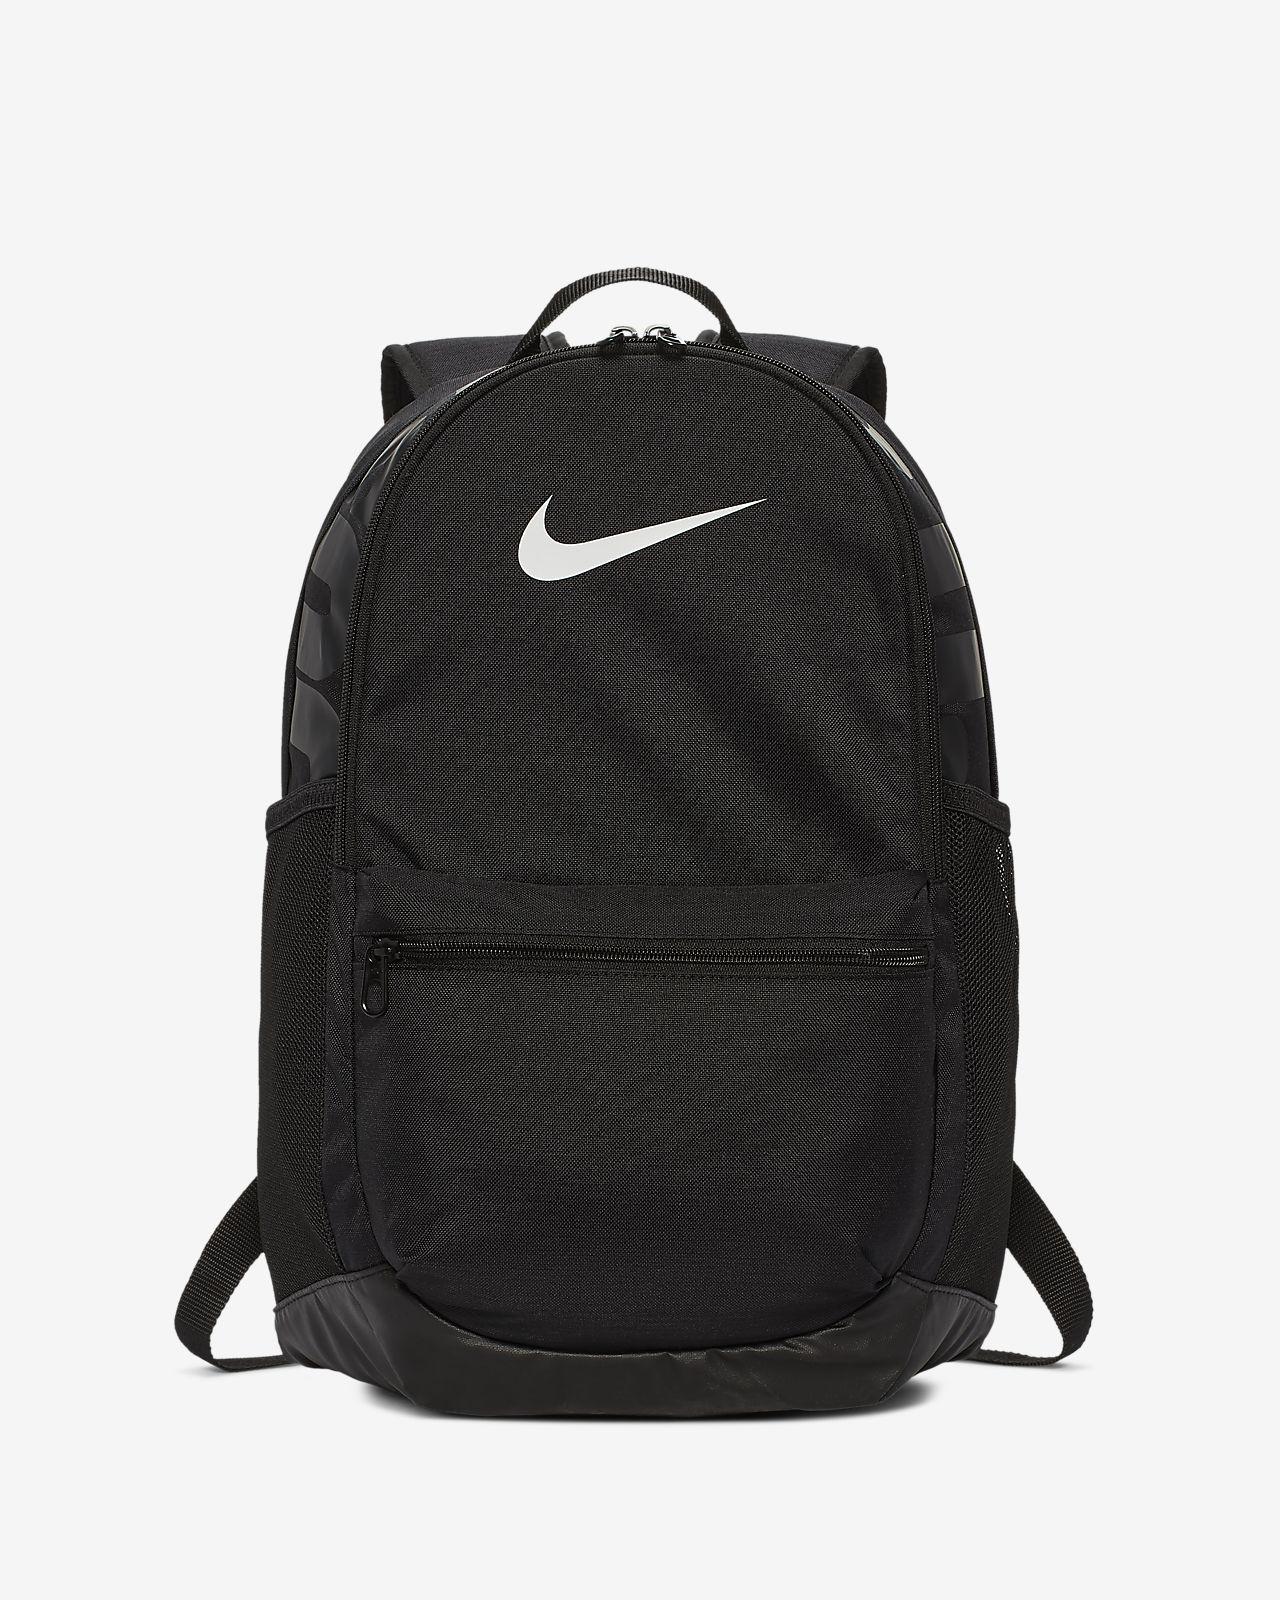 9ab66f928d Nike Brasilia (Medium) Training Backpack. Nike.com NL